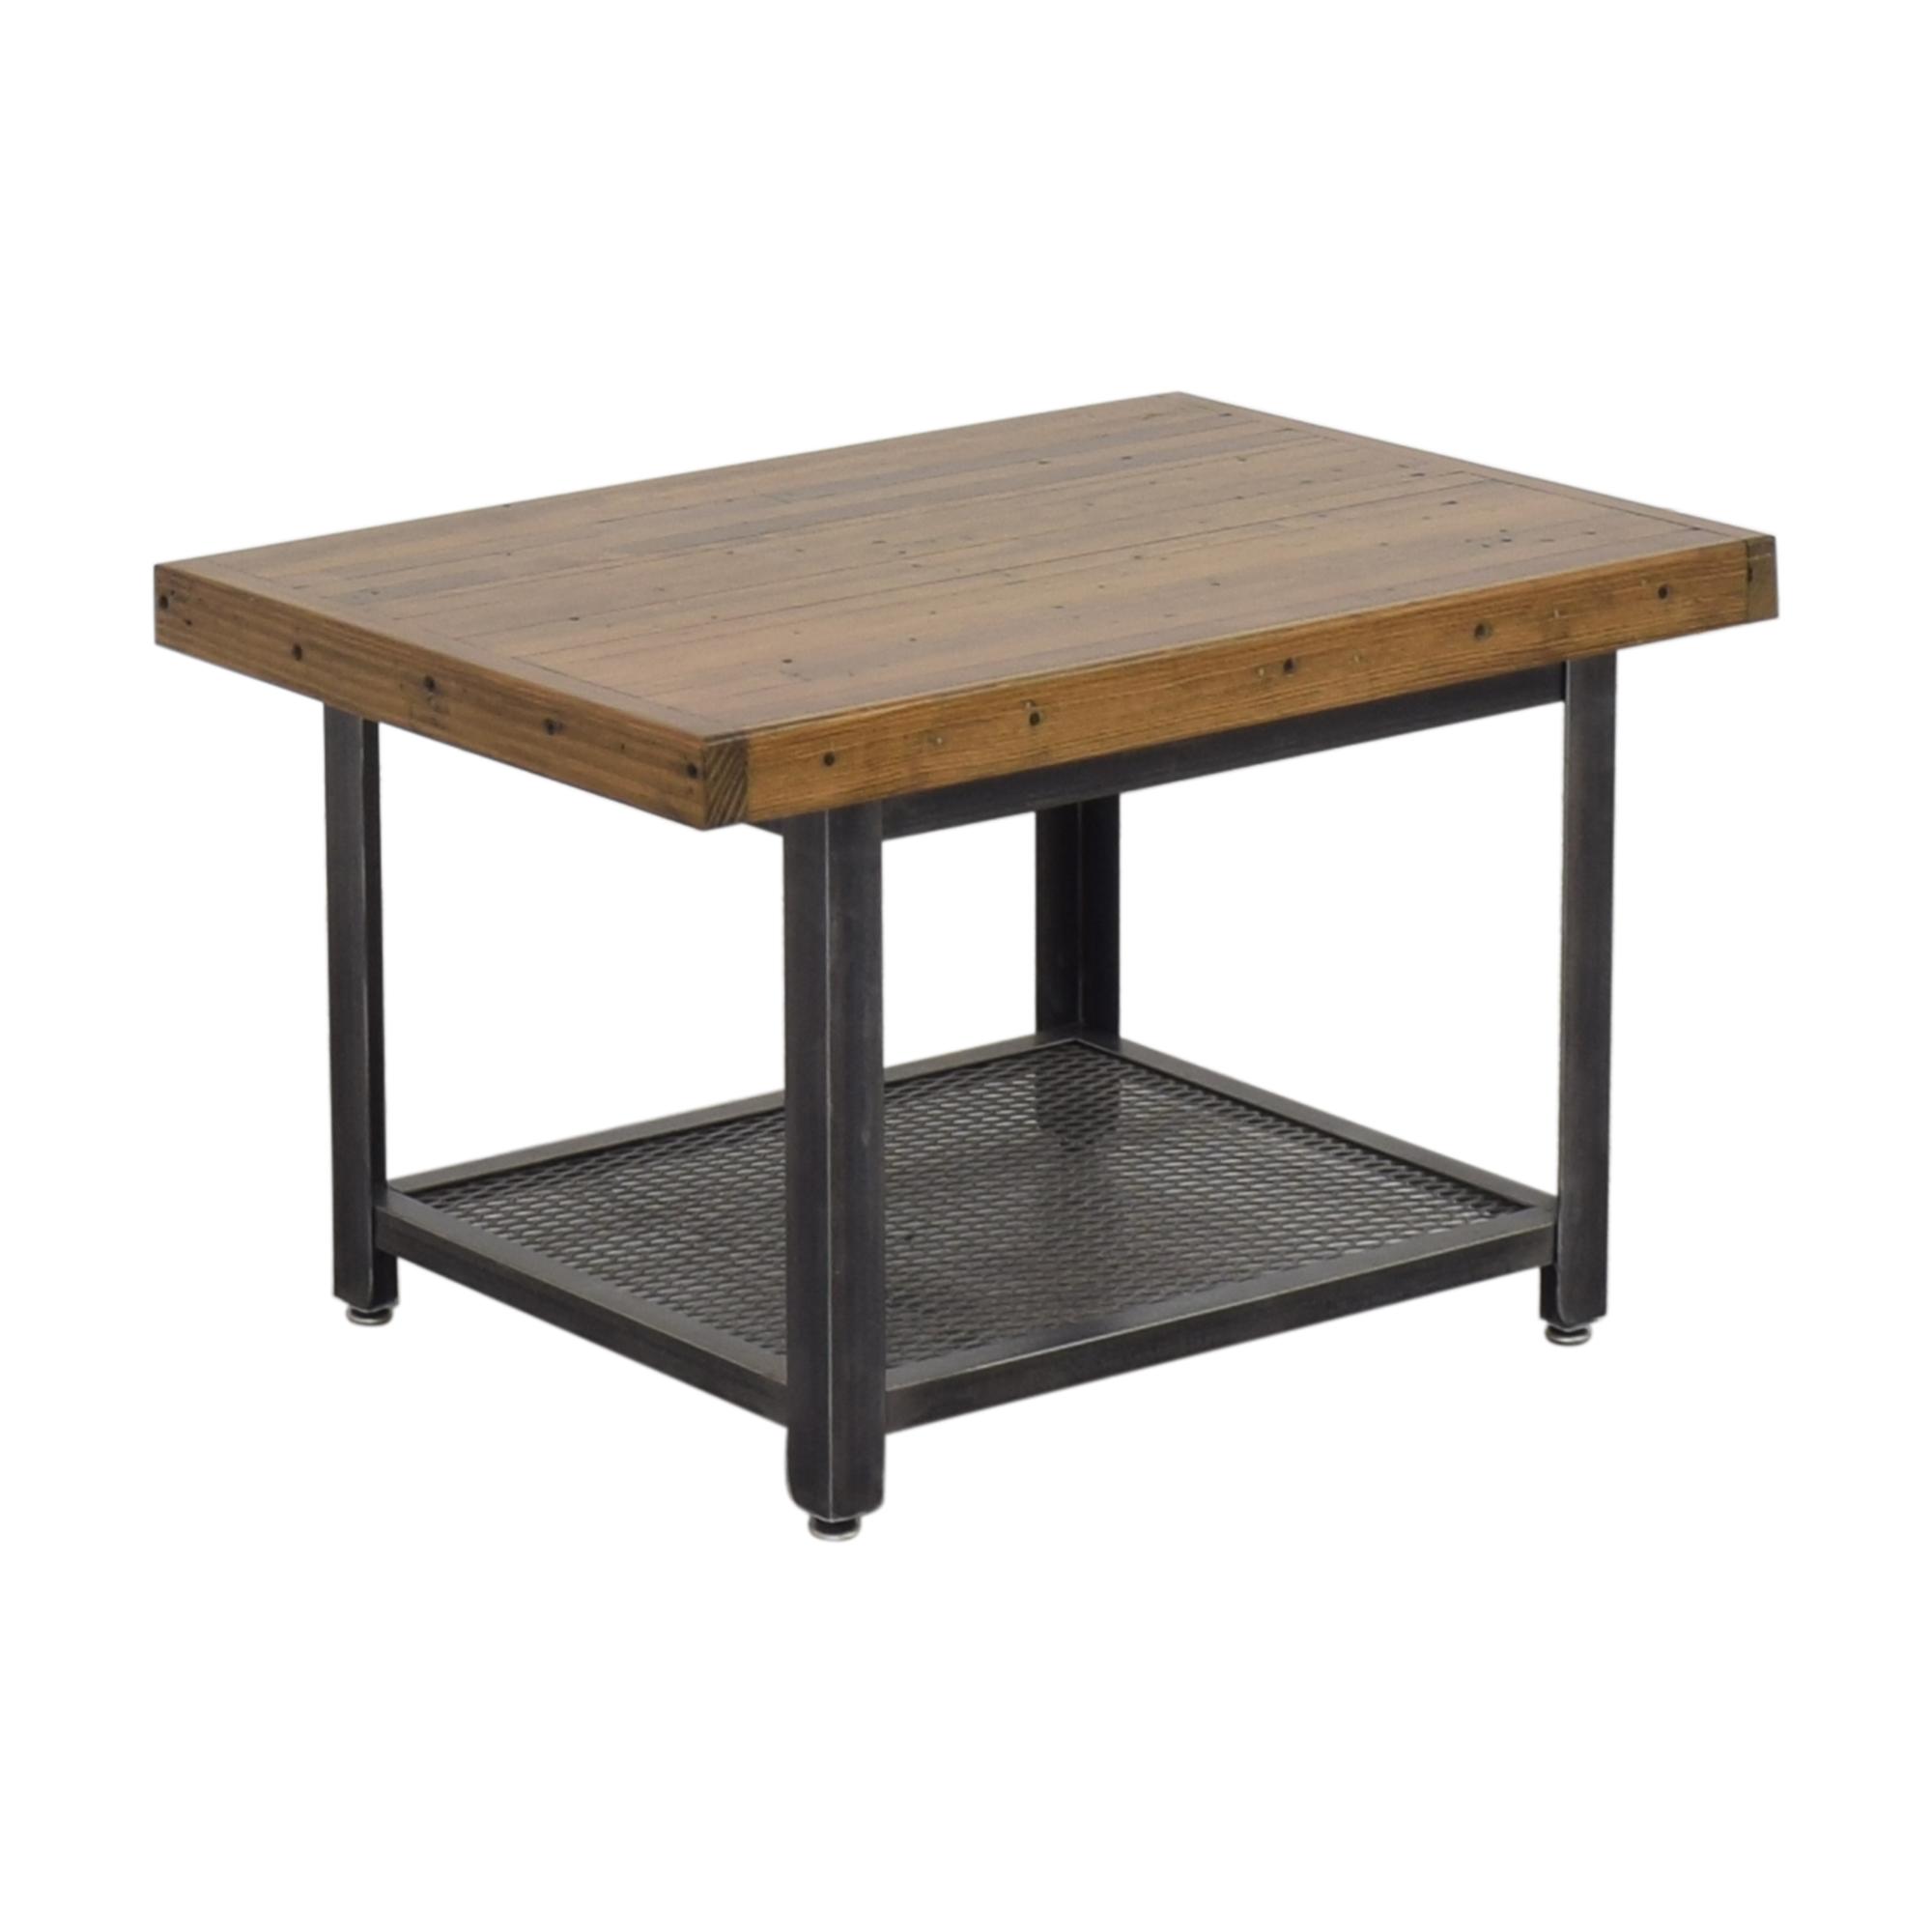 Brooklyn Reclaimed Industrial Coffee Table Coffee Tables